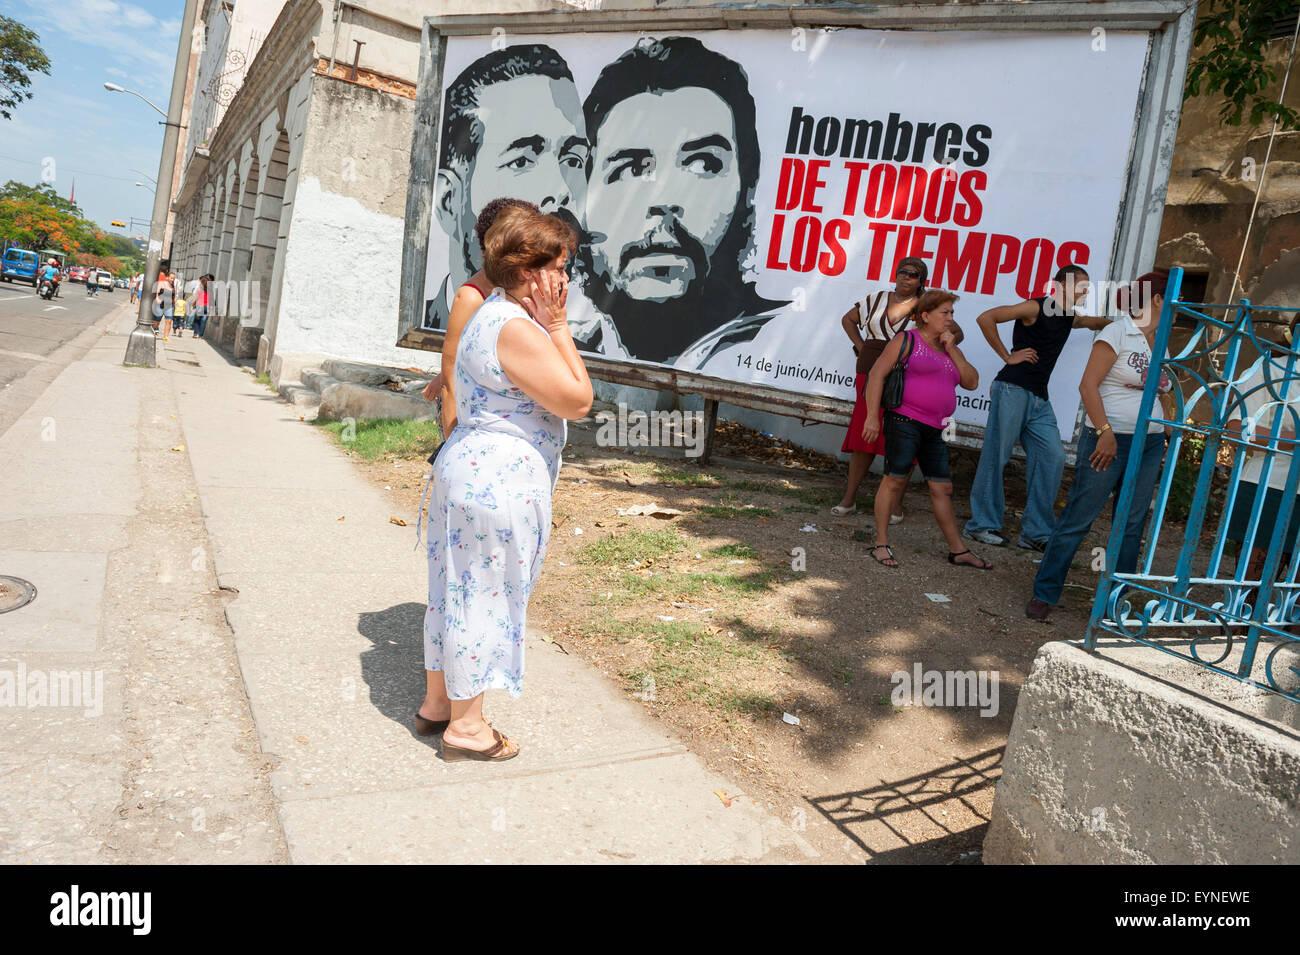 HAVANA, CUBA - JUNE, 2011: Cubans line up in front of a billboard of propaganda featuring revolutionary leaders. - Stock Image